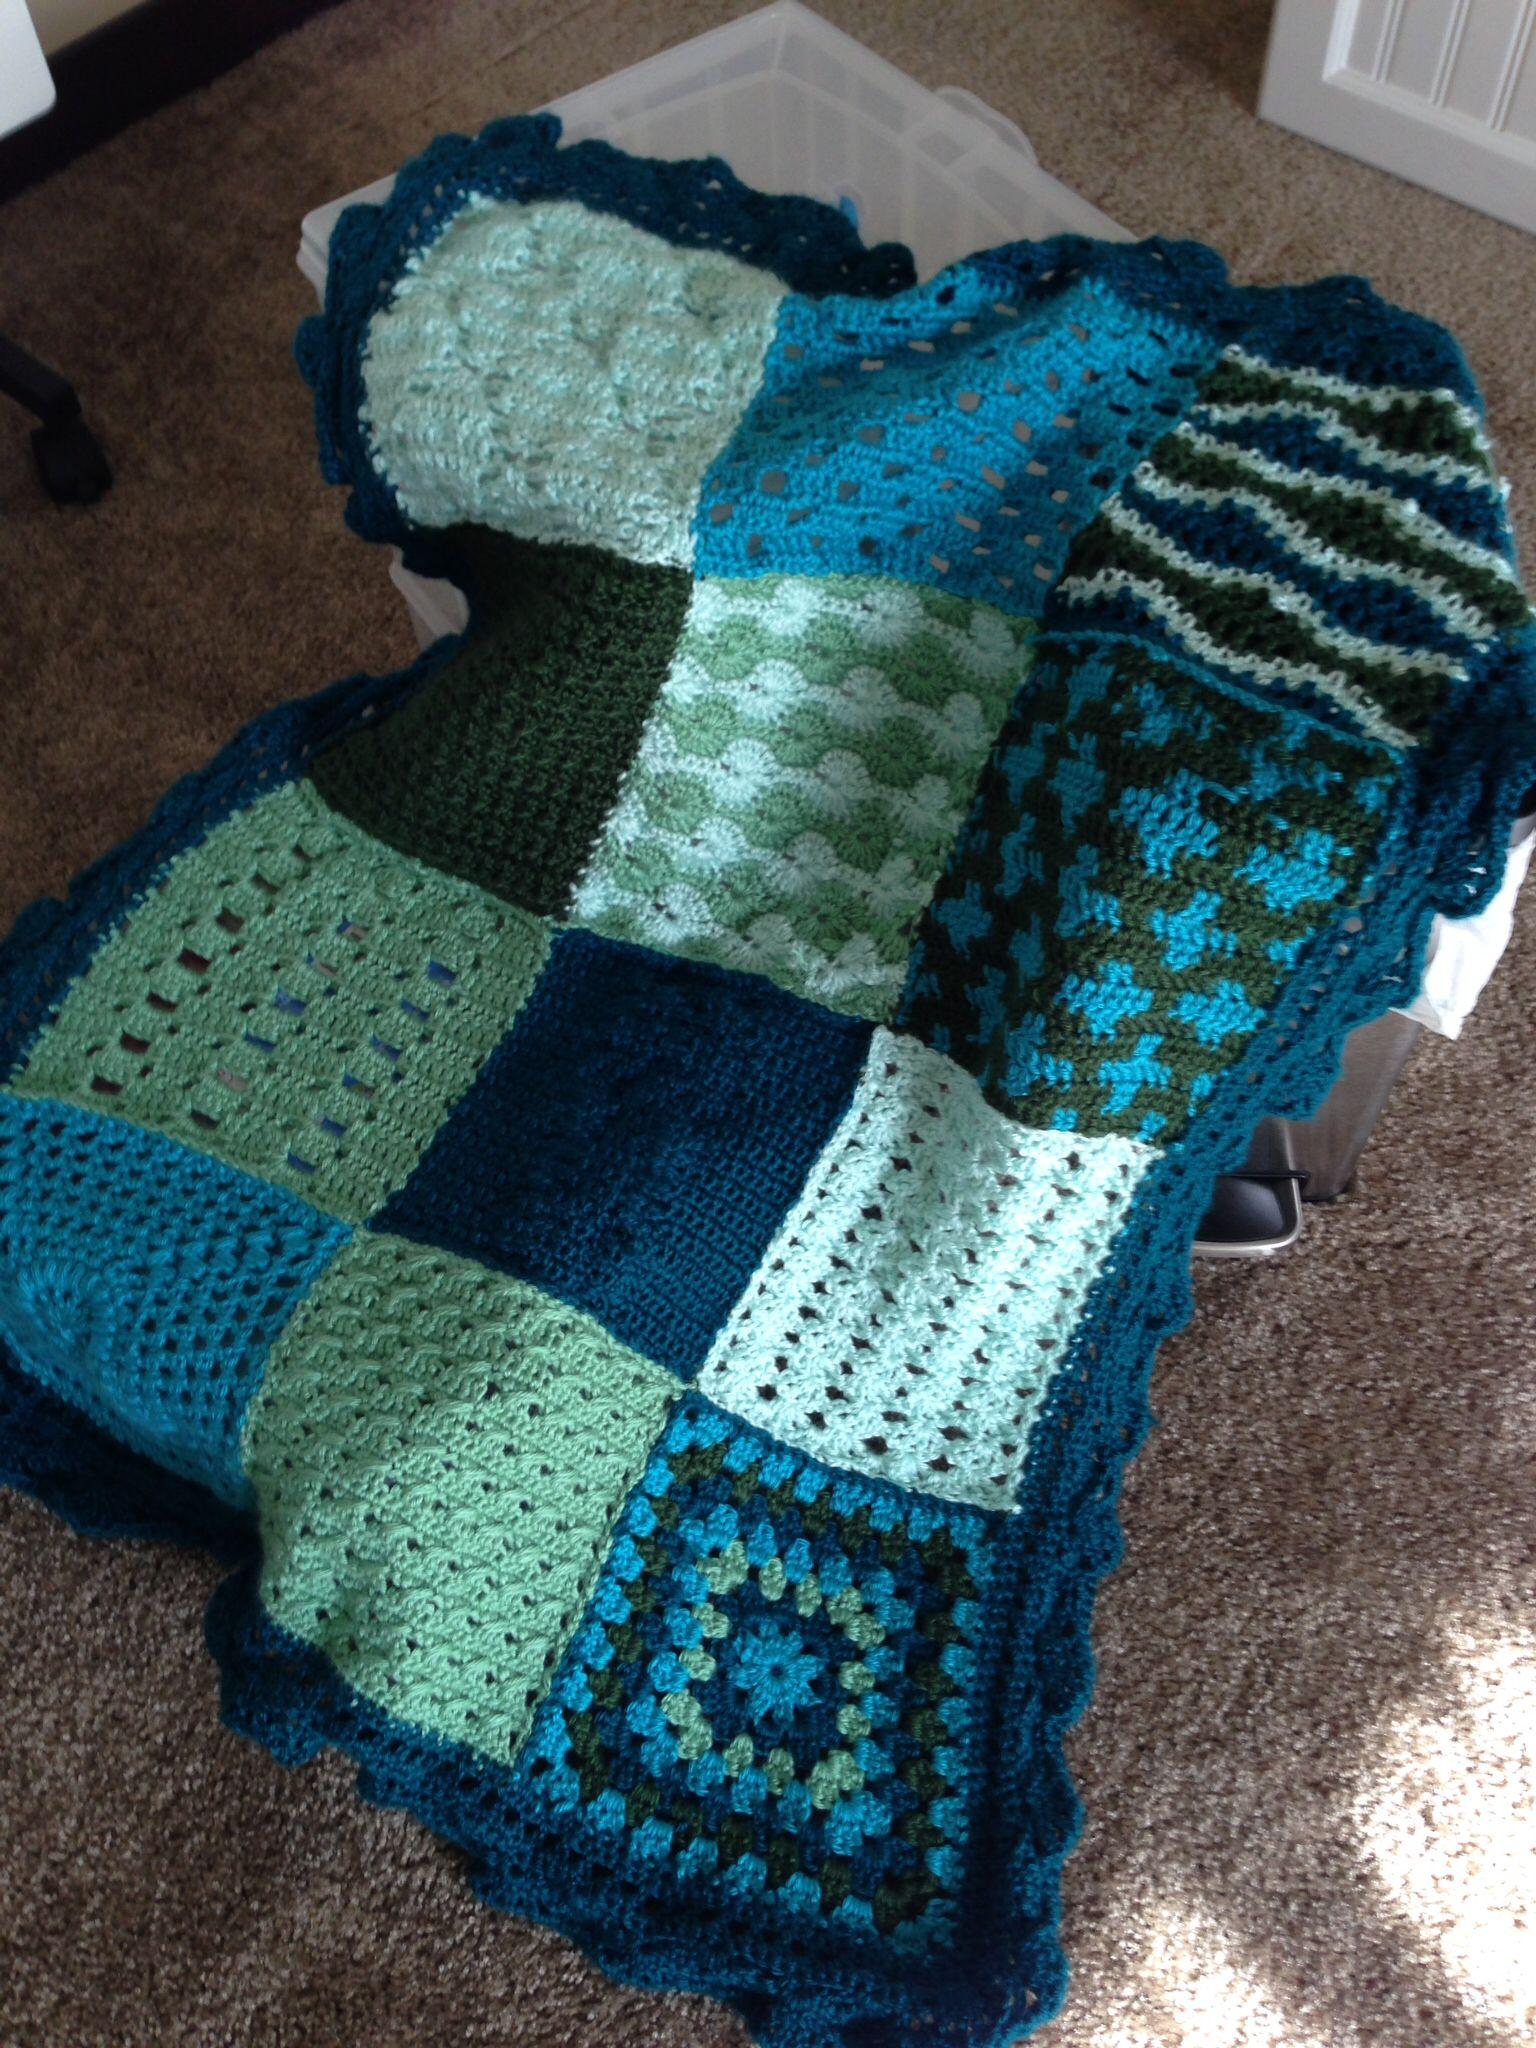 Crochet sampler afghan free pattern from redheart my crochet sampler afghan free pattern from redheart bankloansurffo Gallery